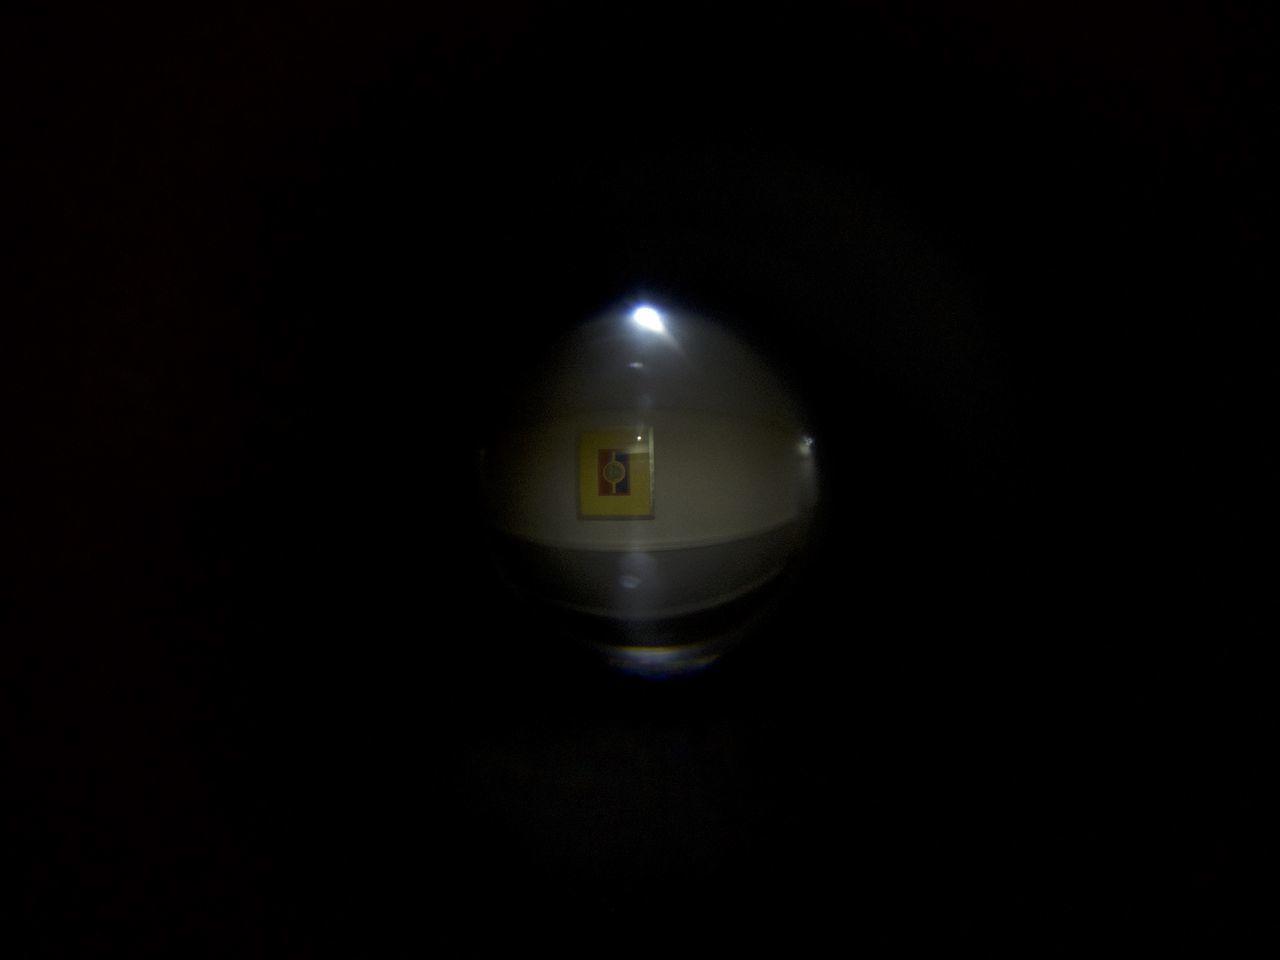 illuminated, copy space, lighting equipment, indoors, darkroom, no people, close-up, studio shot, black background